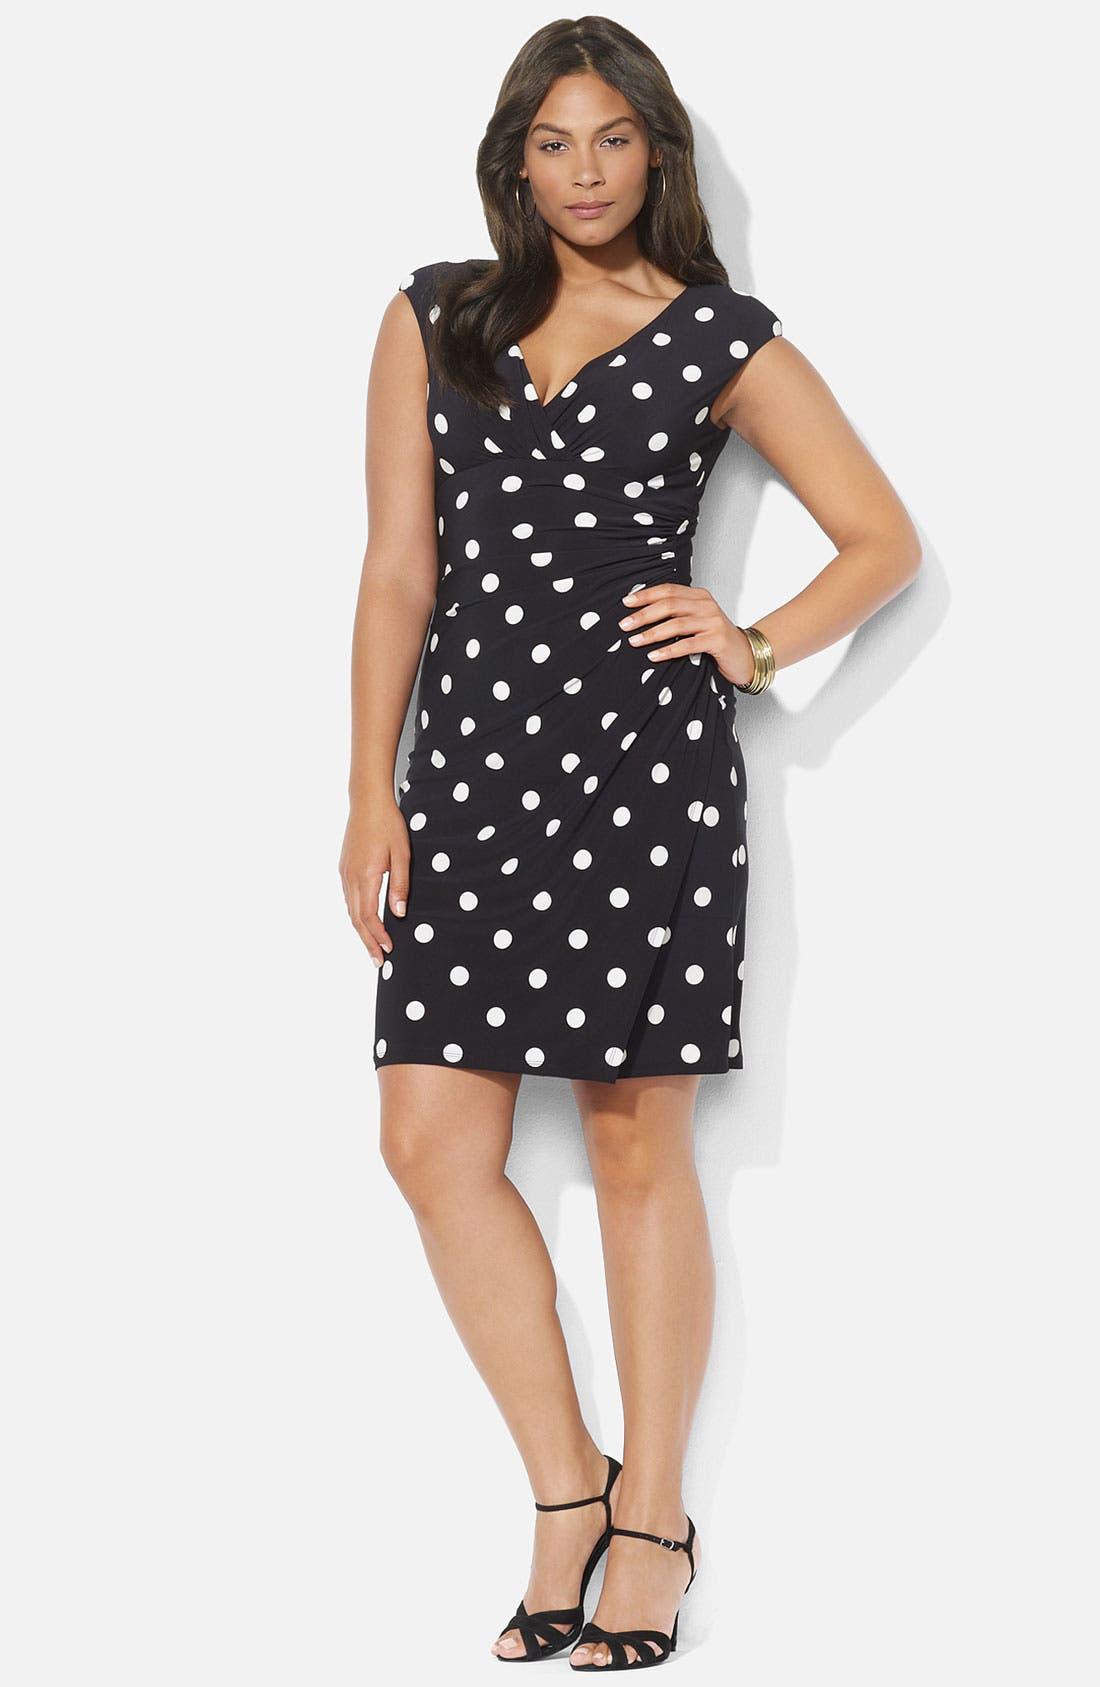 Alternate Image 1 Selected - Lauren Ralph Lauren Polka Dot Surplice Matte Jersey Sheath Dress (Plus)